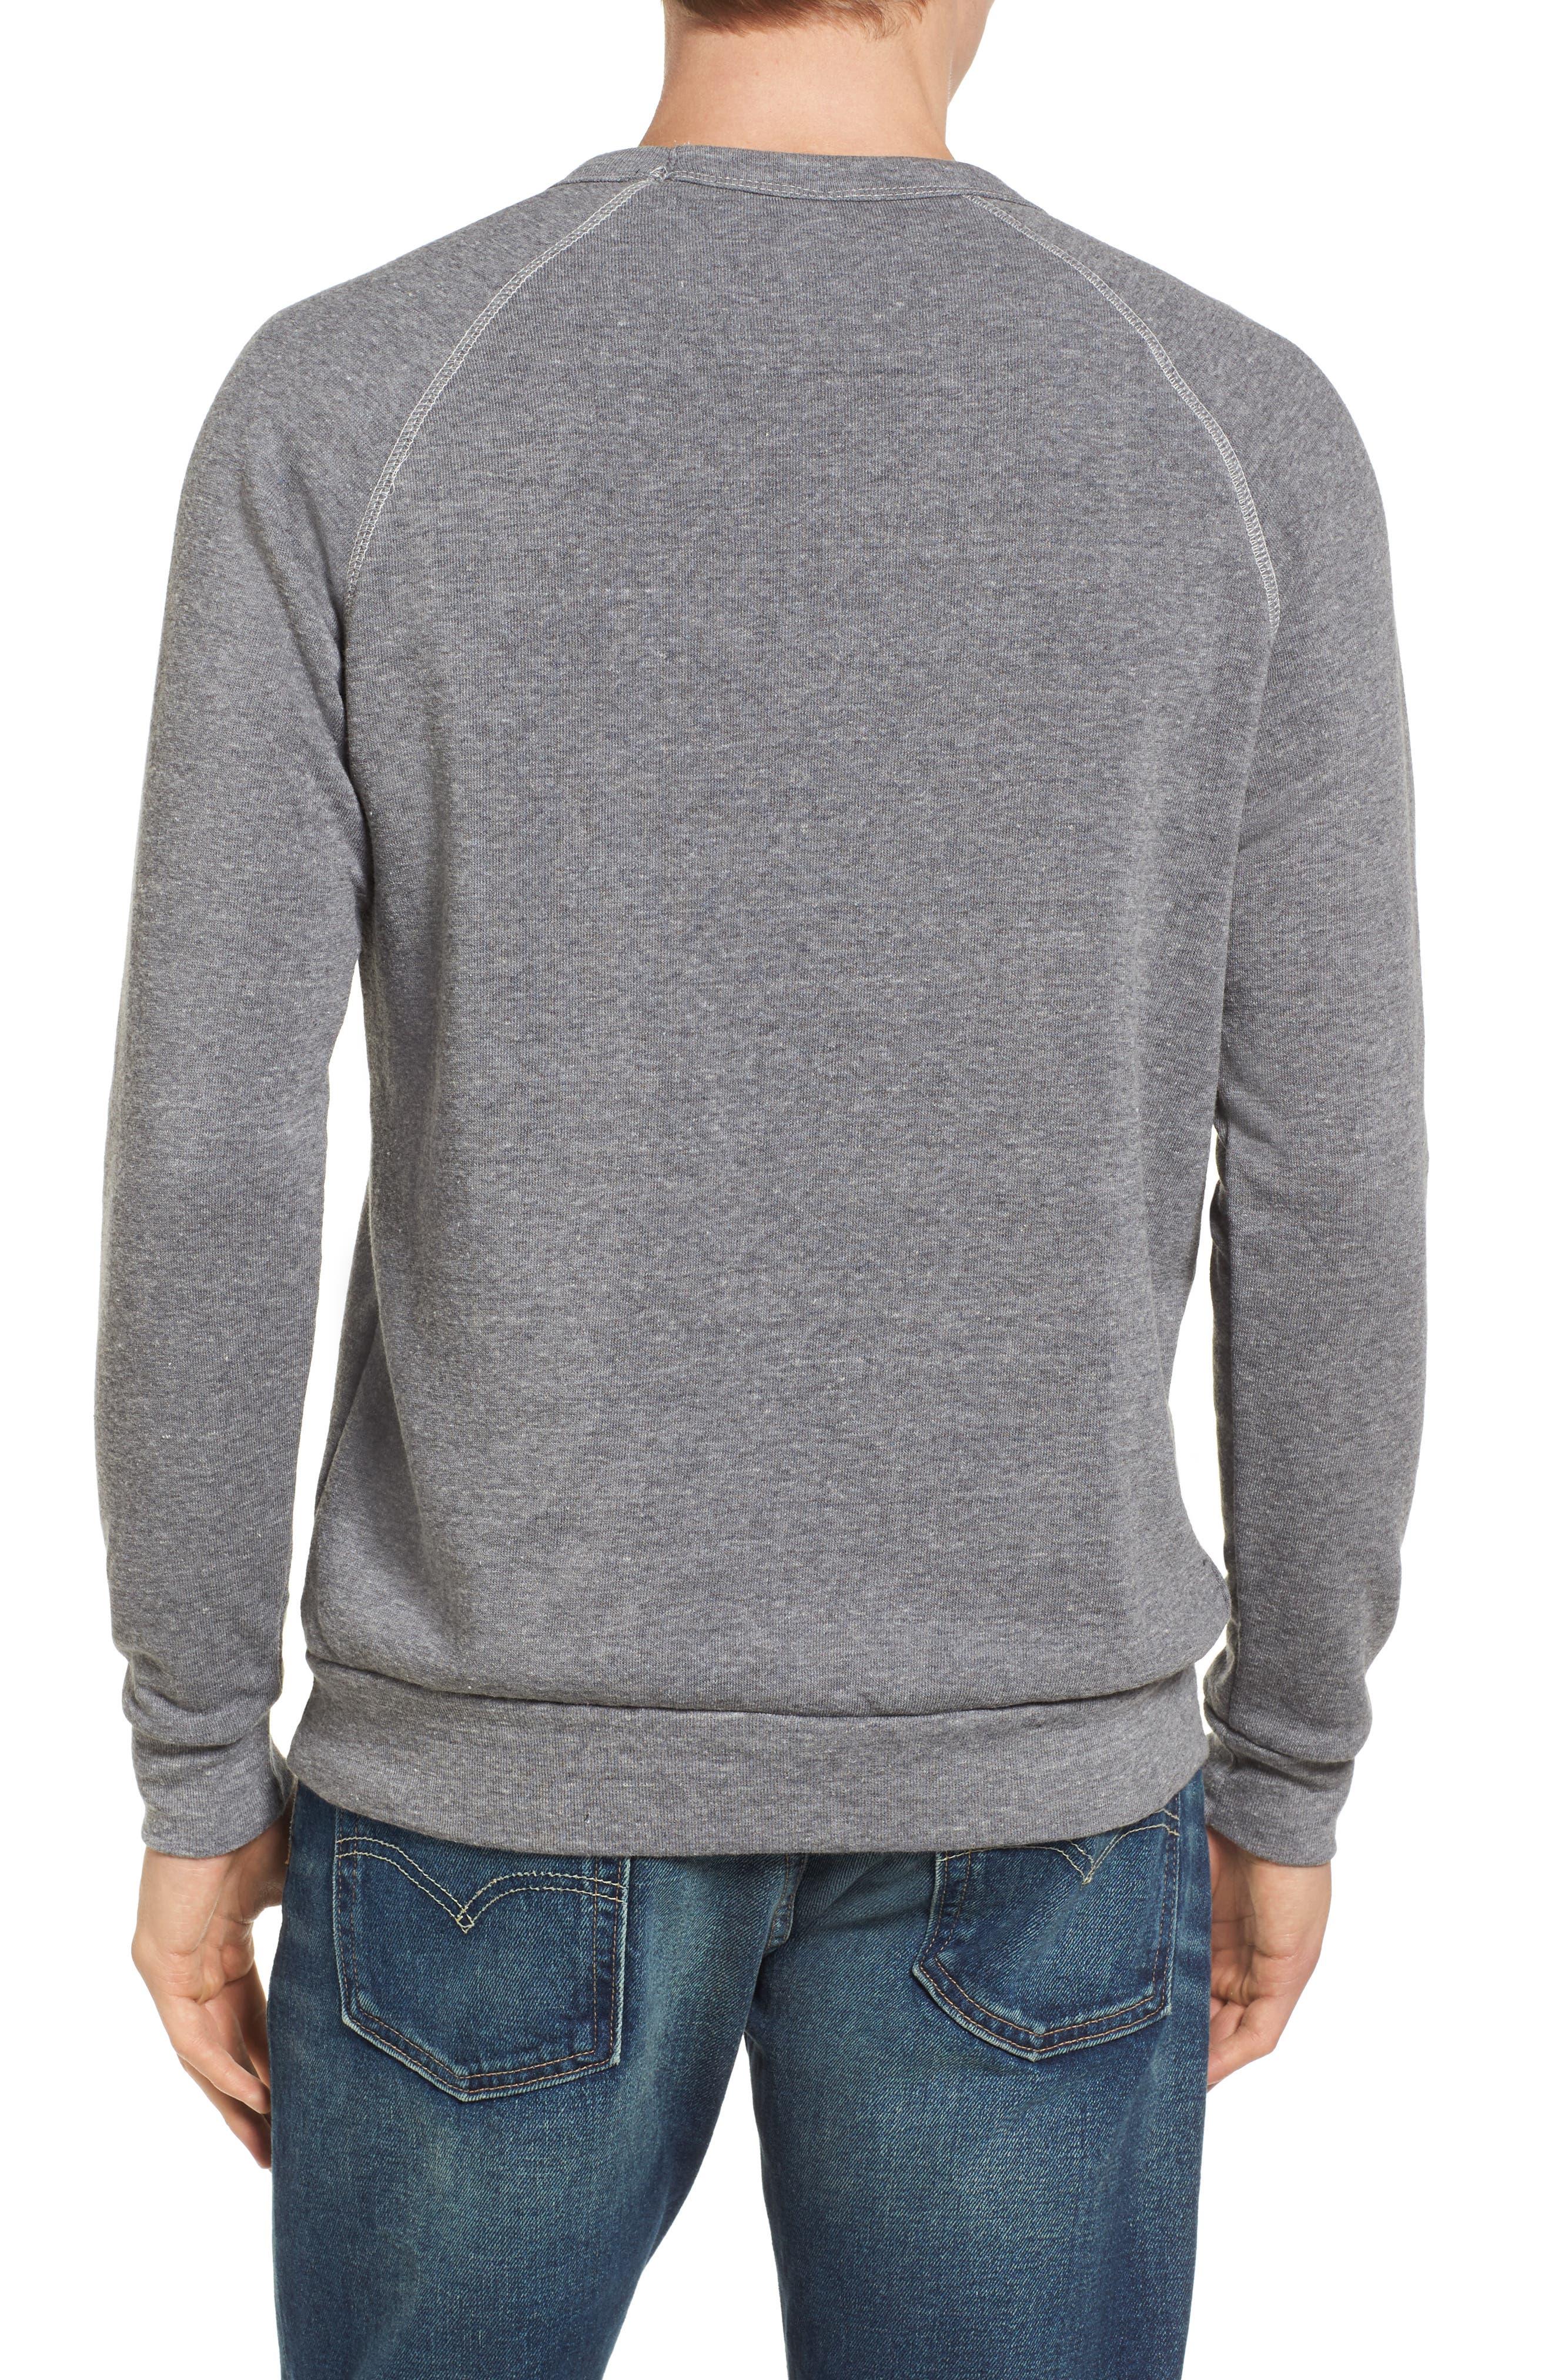 'The Champ' Sweatshirt,                             Alternate thumbnail 18, color,